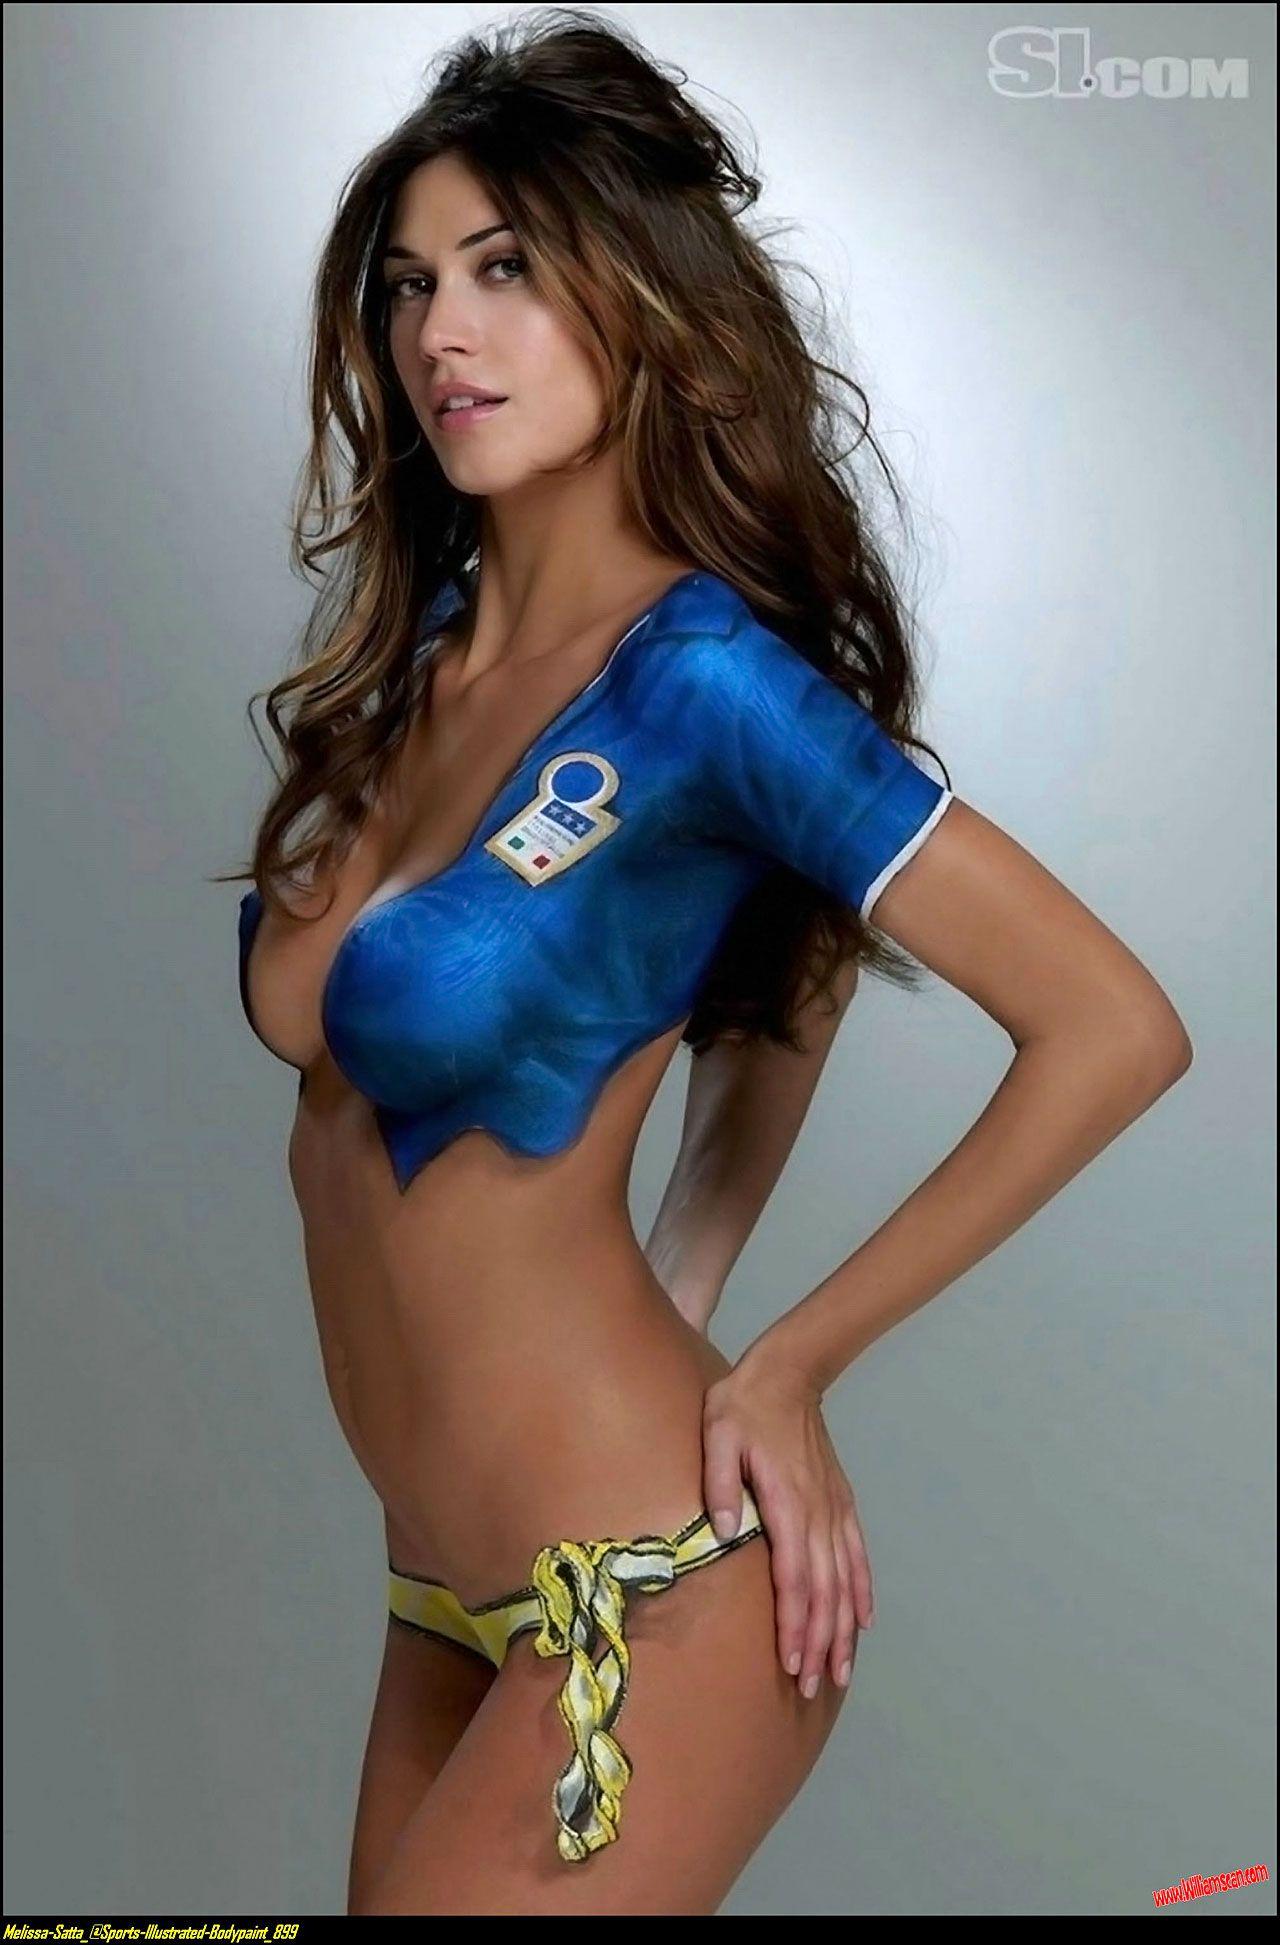 da570b7c715e6 sports illustrated swimsuit issue body painting | melissa satta ...